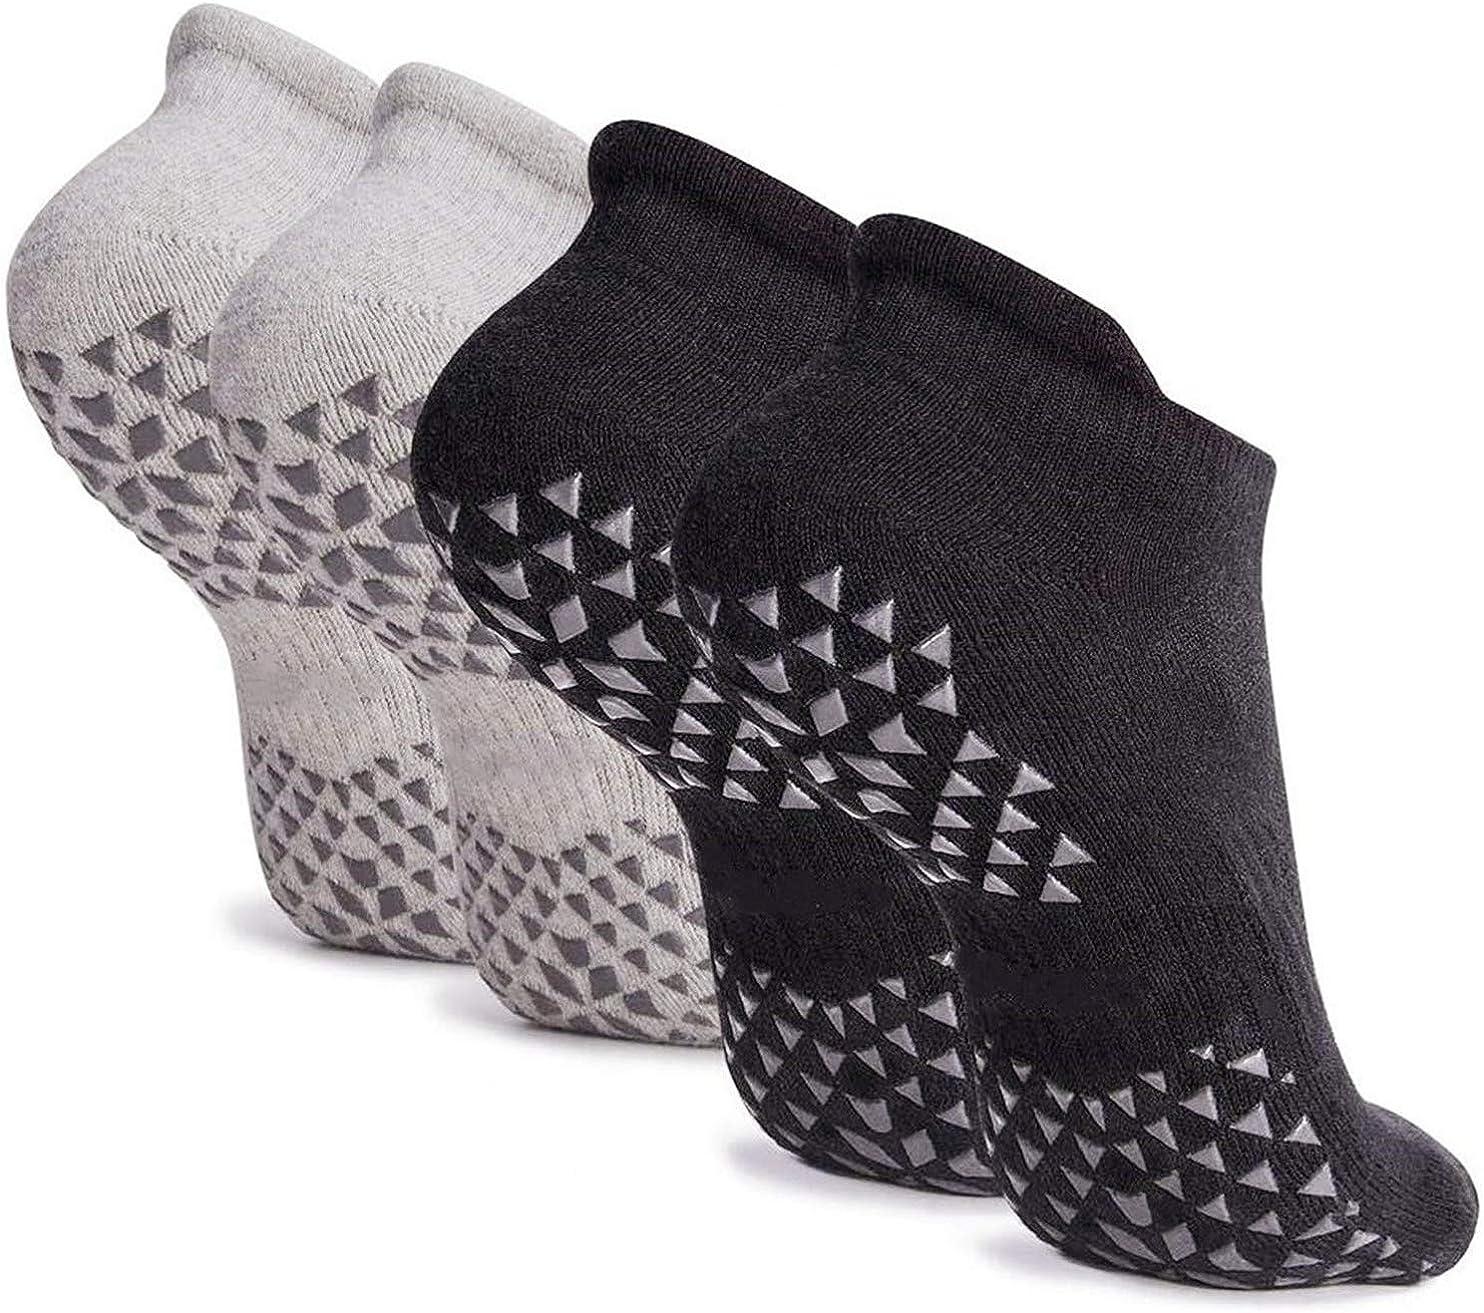 Hirsrian Unisex Non Slip Grip Socks for Yoga, Hospital, Pilates, Barre | Ankle, Cushioned: Clothing